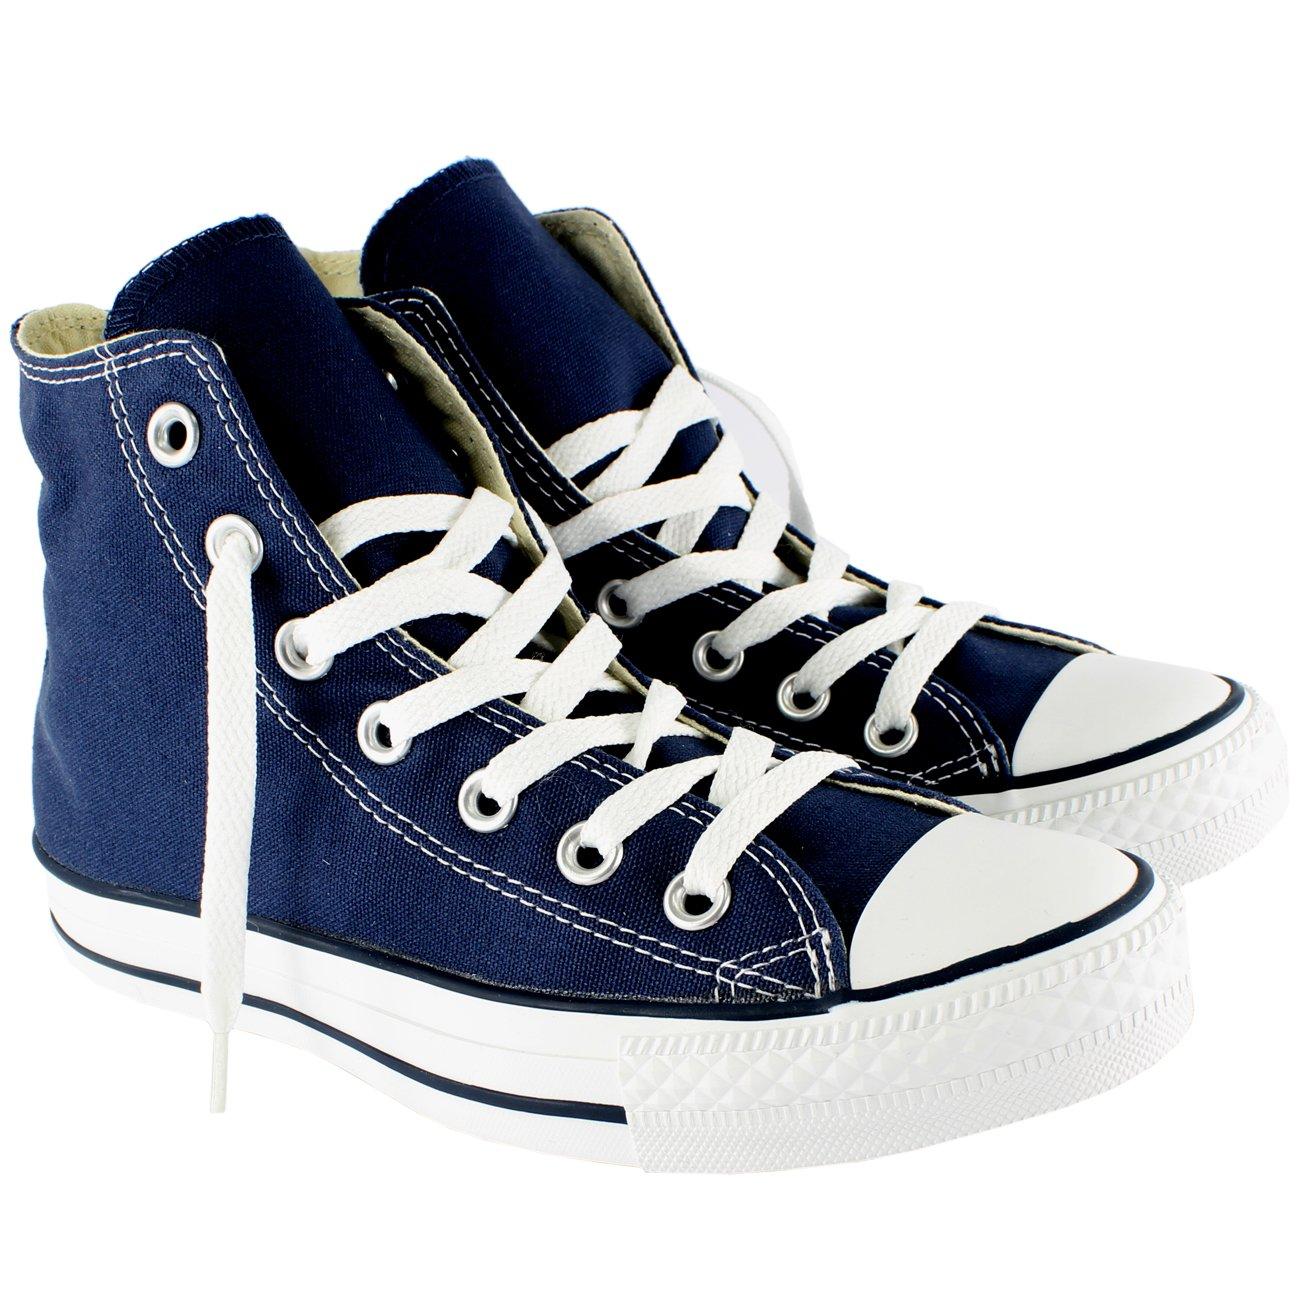 Converse All Star Hi - Hauszapatos unisex azul Mare